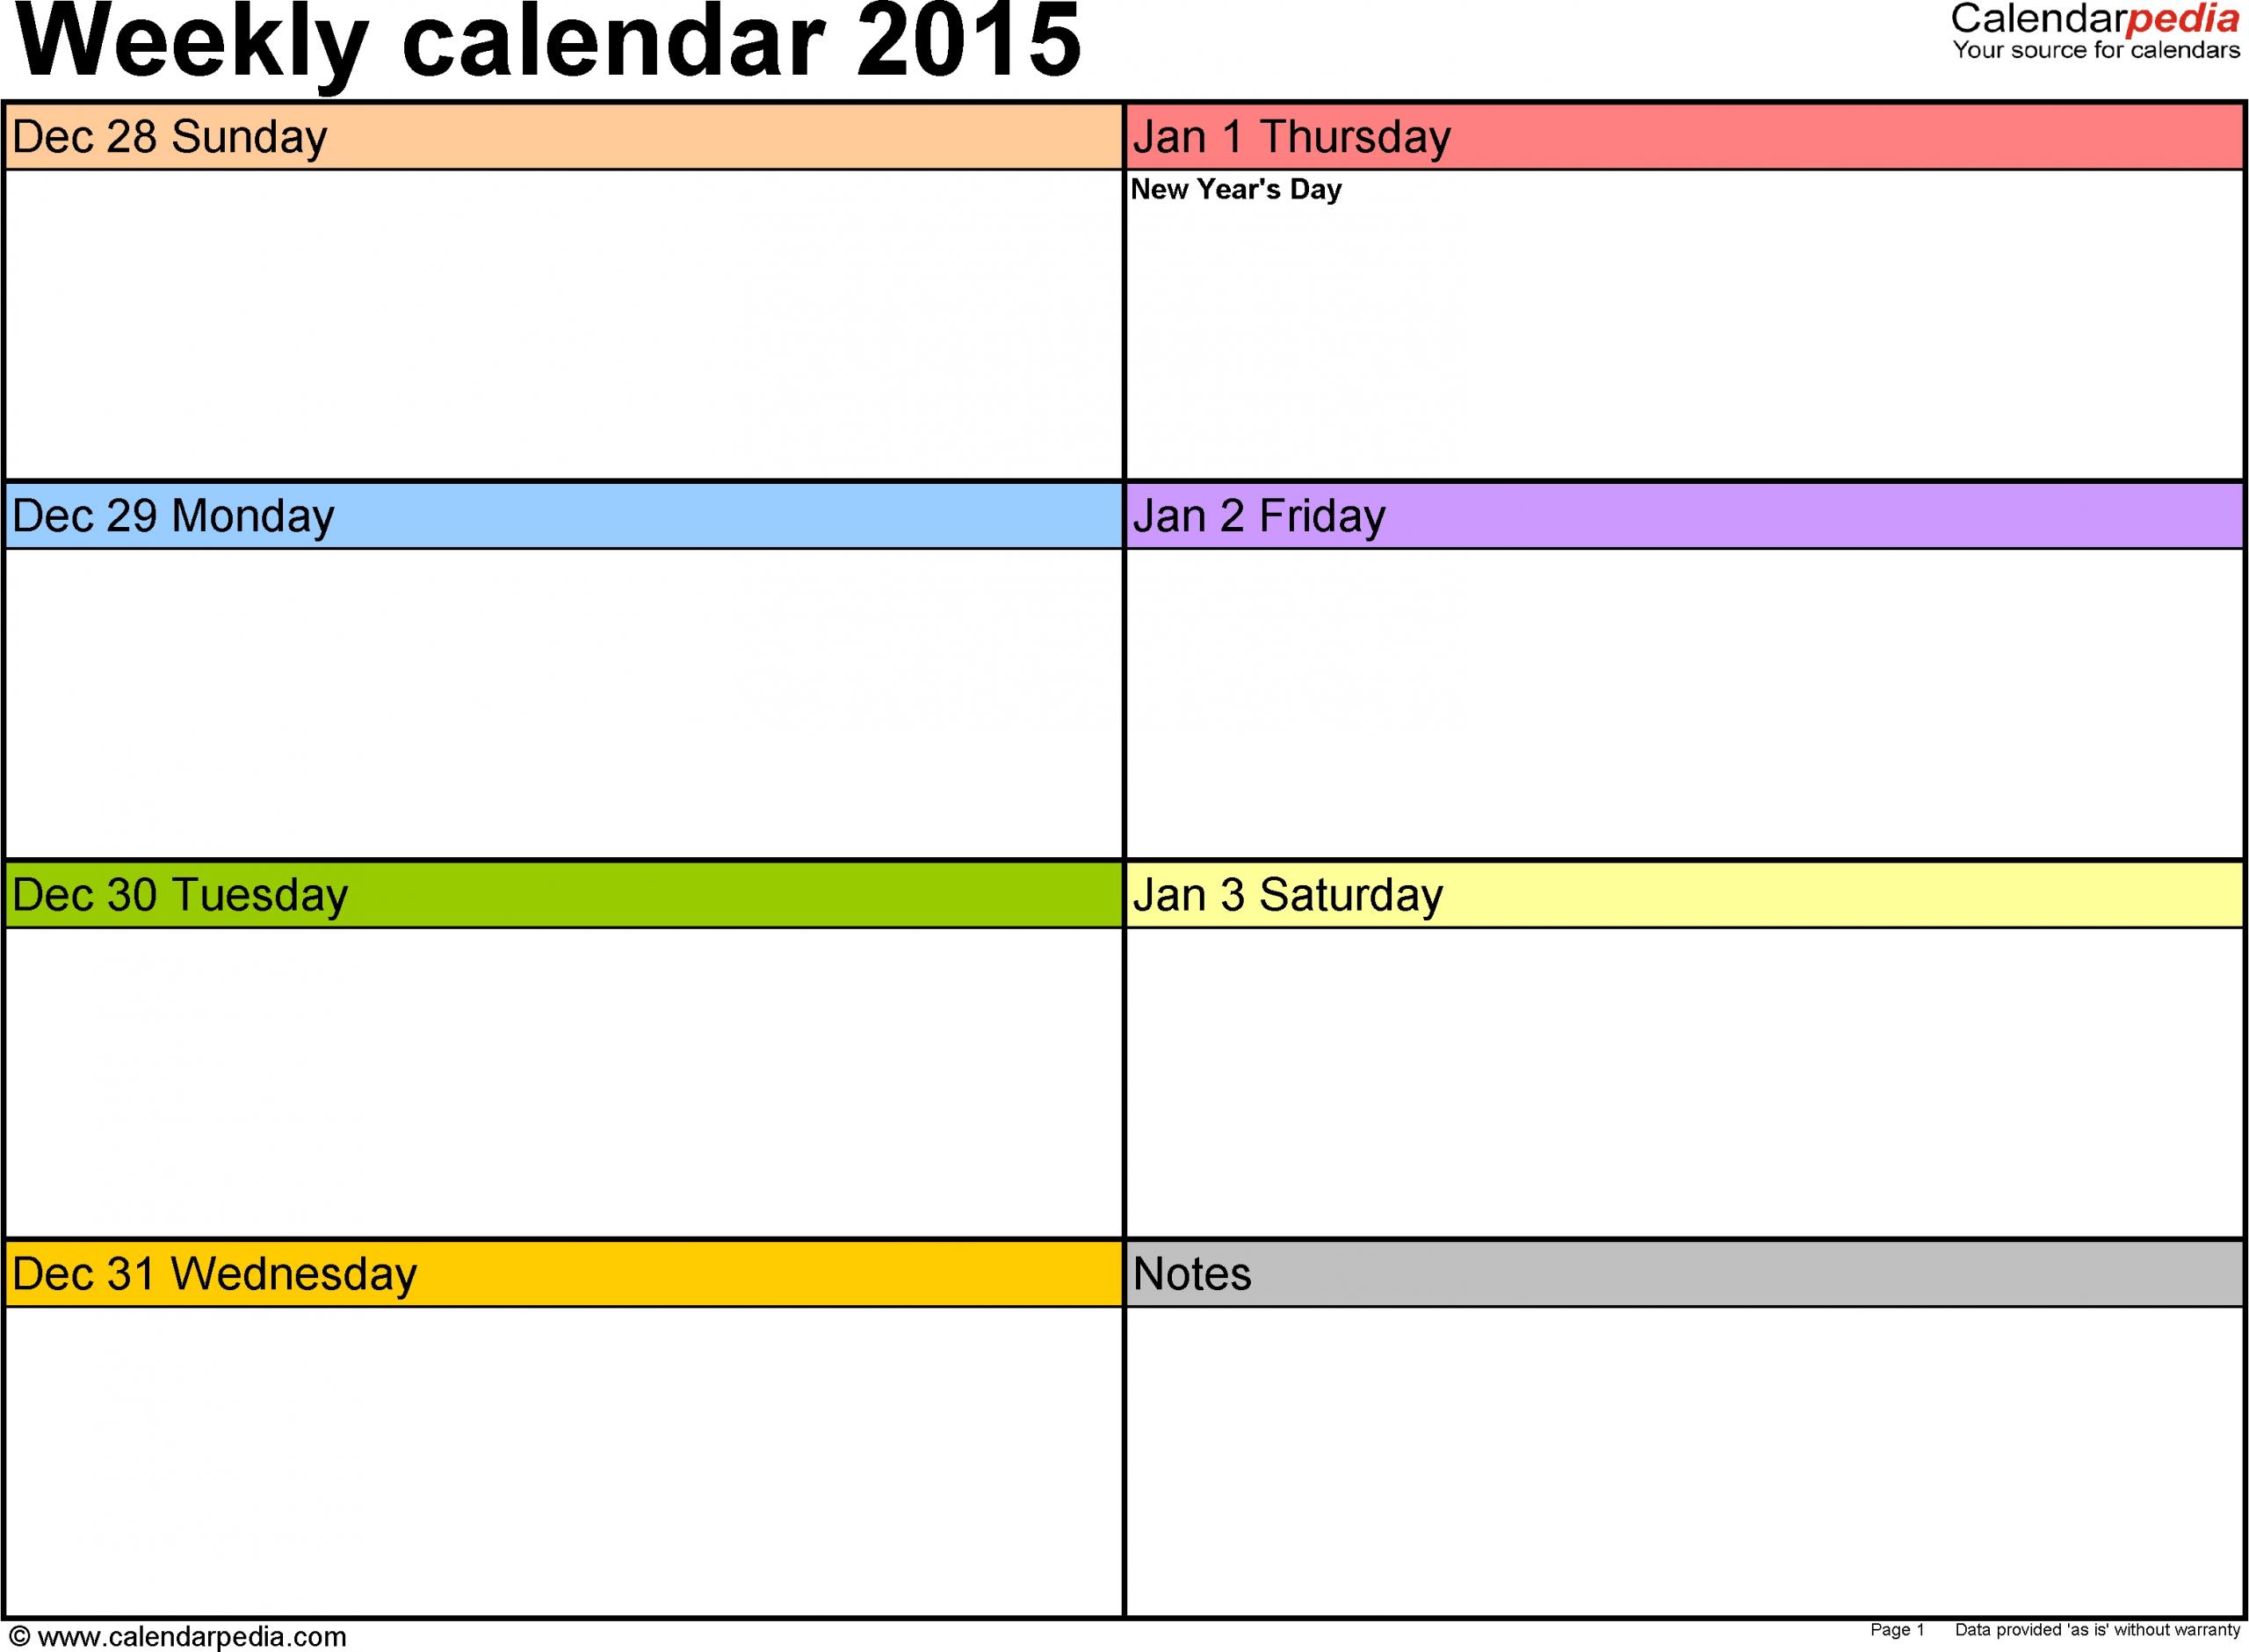 Weekly Calendar 2015 For Excel - 12 Free Printable Templates   Weekly Calendar Template, Weekly